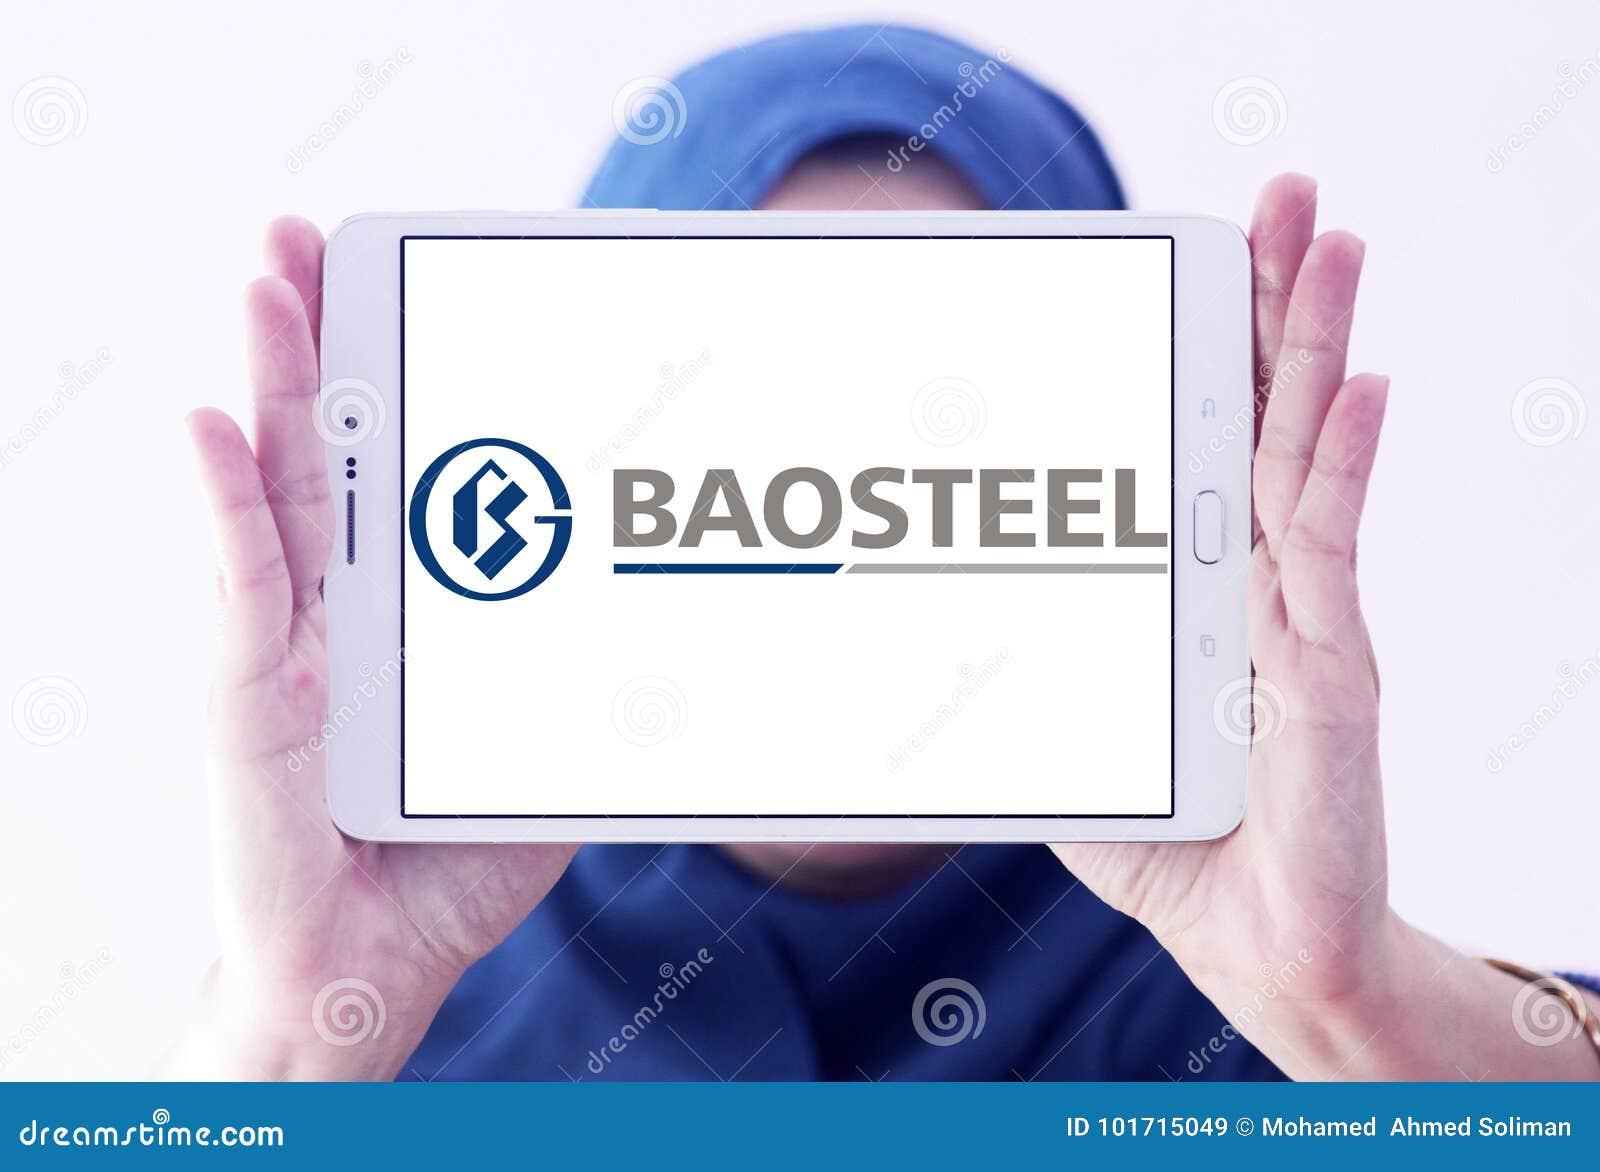 China Baowu Steel Group Logo Editorial Stock Image Image Of